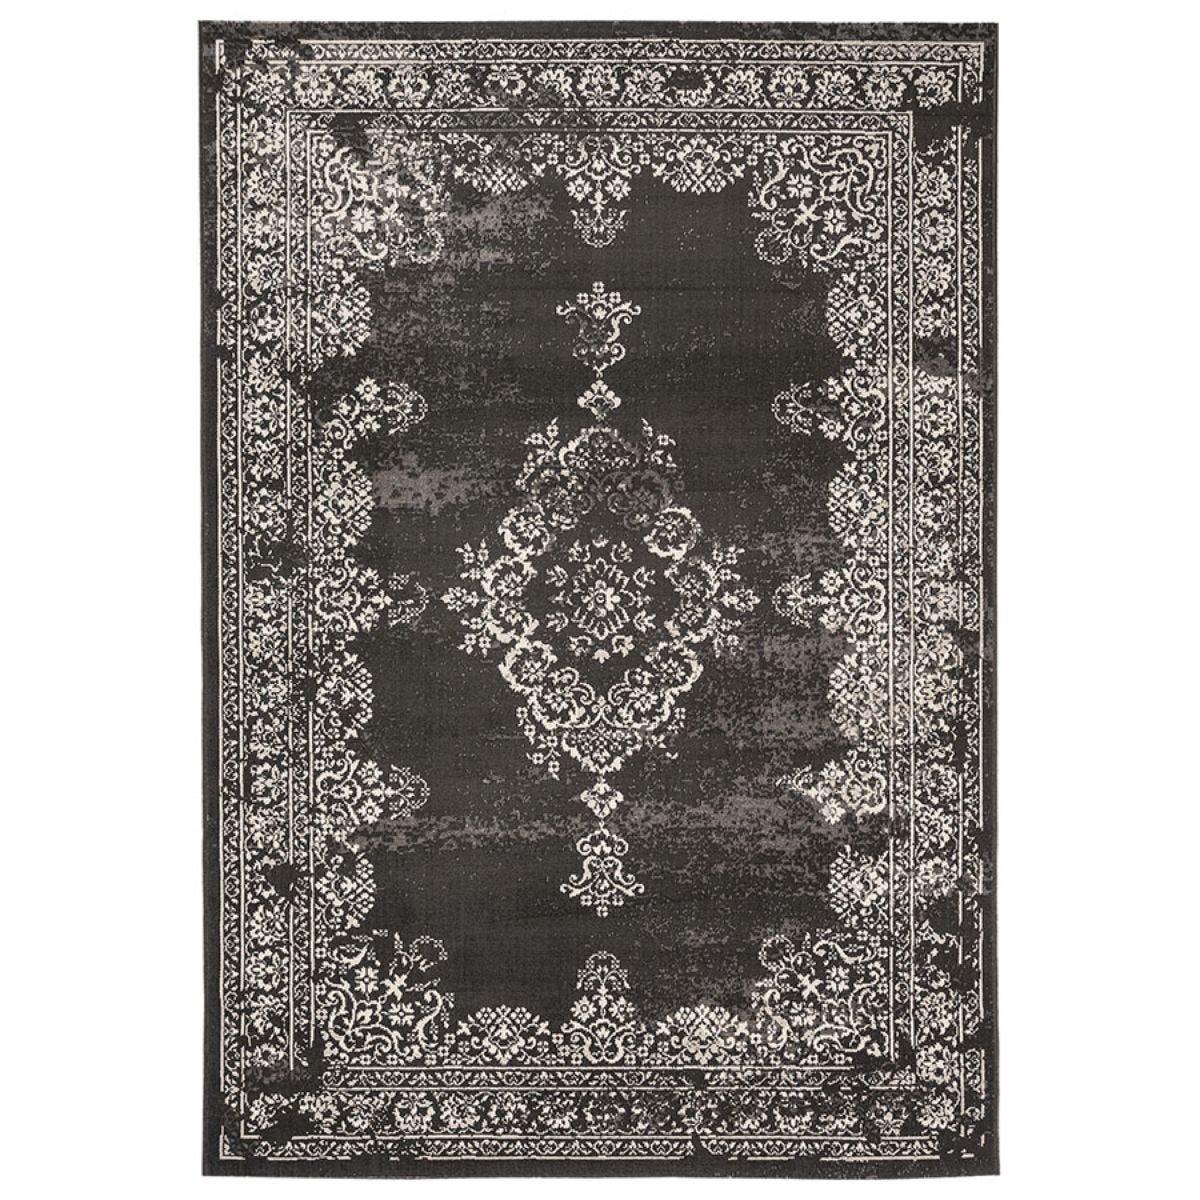 Asiatic Revive Rug, 120 x 170cm - Black